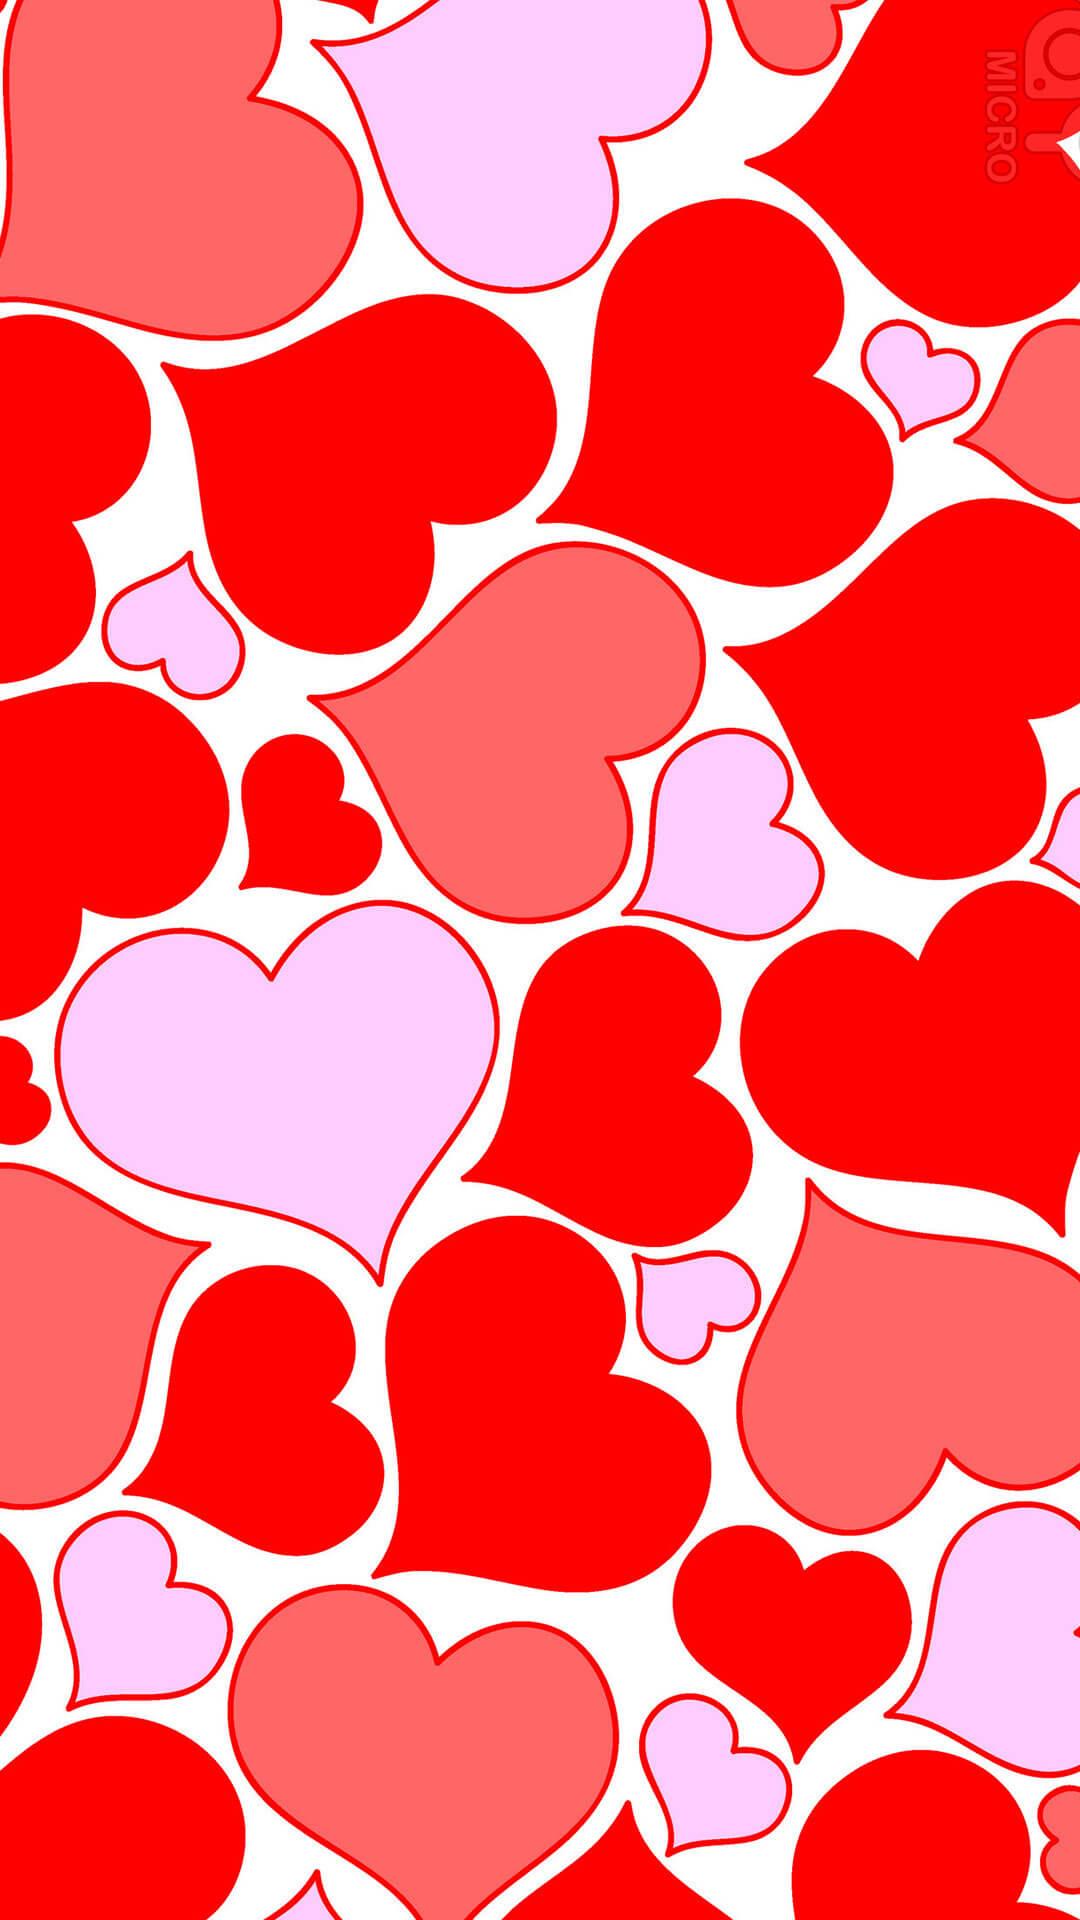 Hd Love Wallpaper Android Wallpaper Full Hd Love Wallpaper Hd 1080x1920 Download Hd Wallpaper Wallpapertip